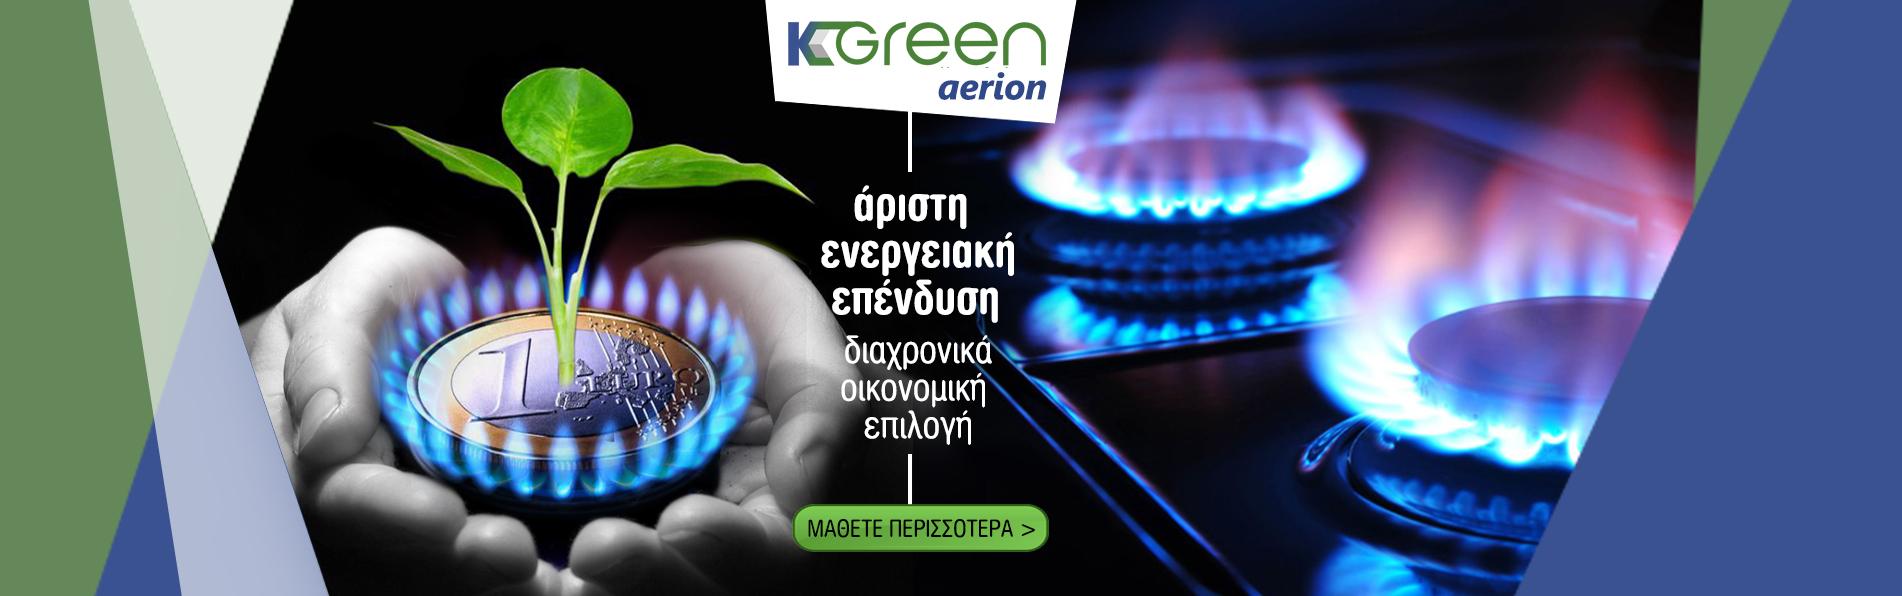 kgreen φυσικό αέριο